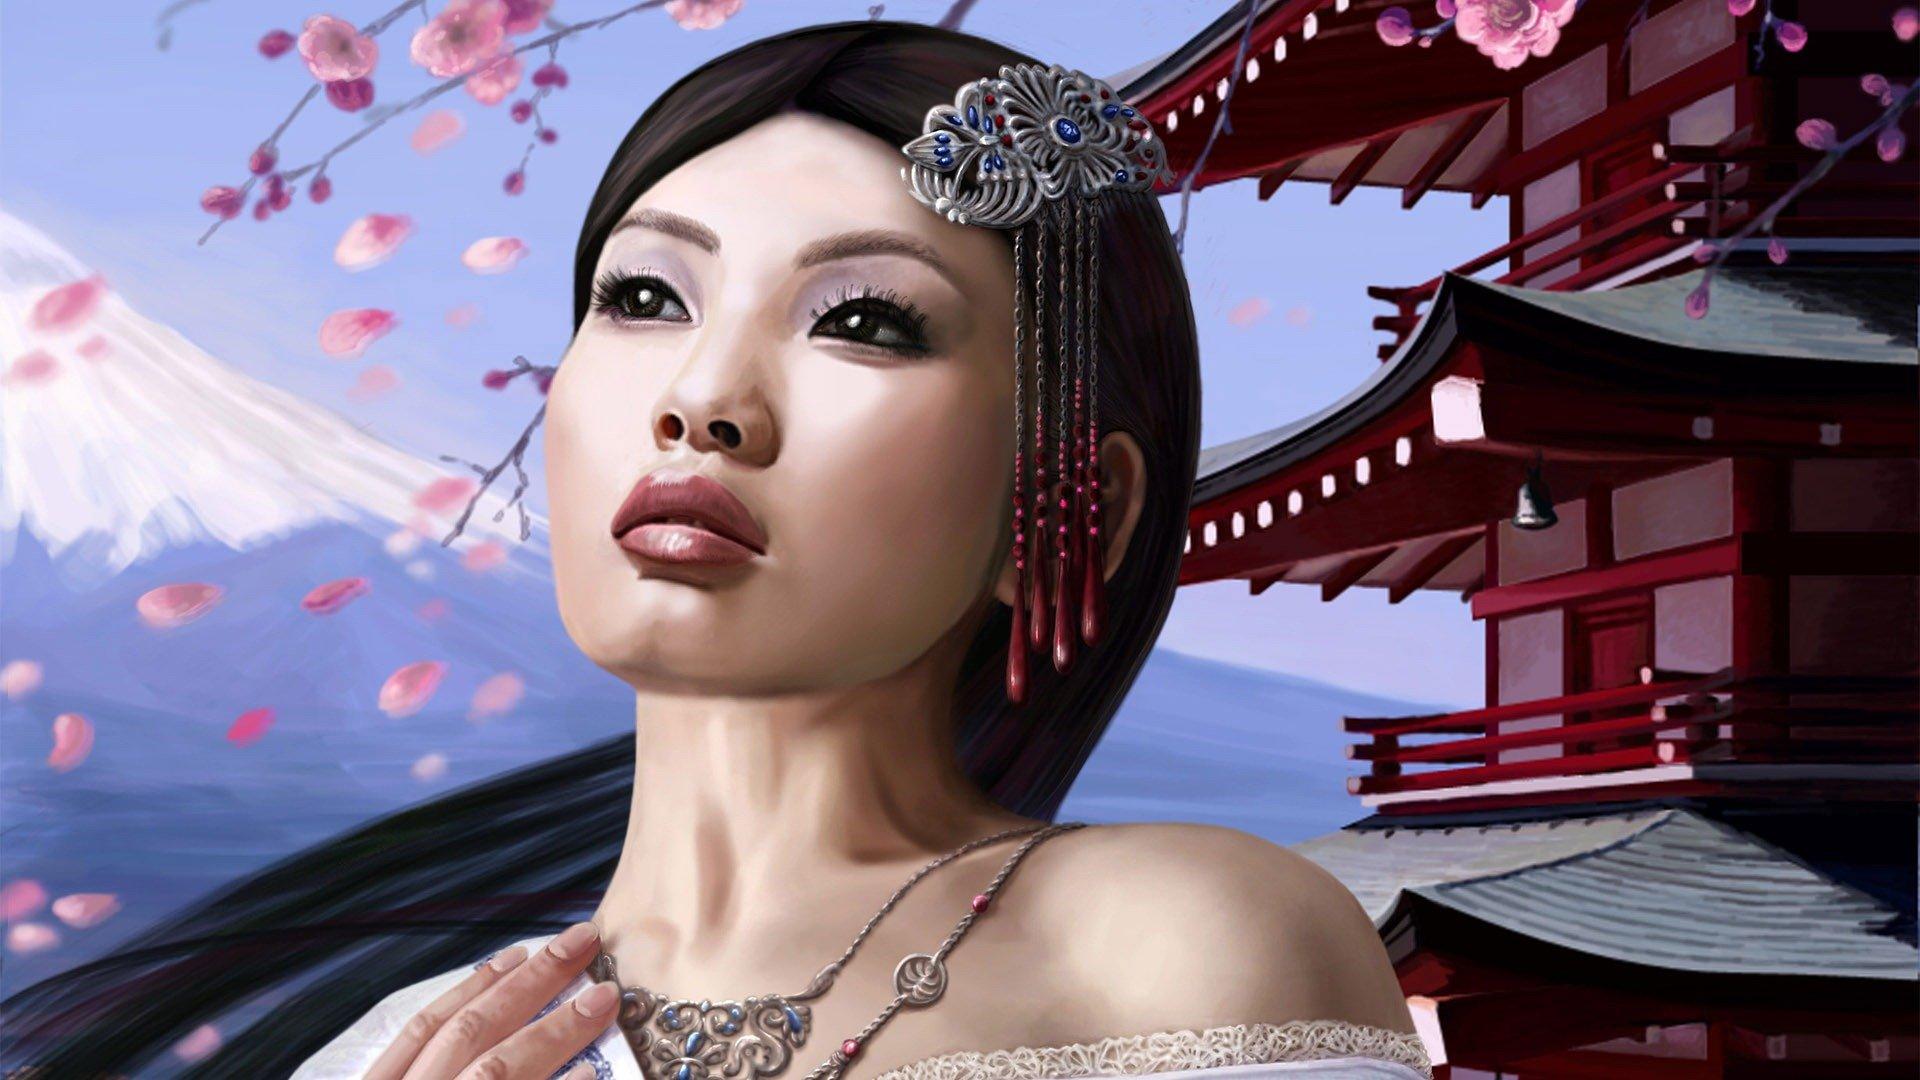 Oriental girl gallery #1